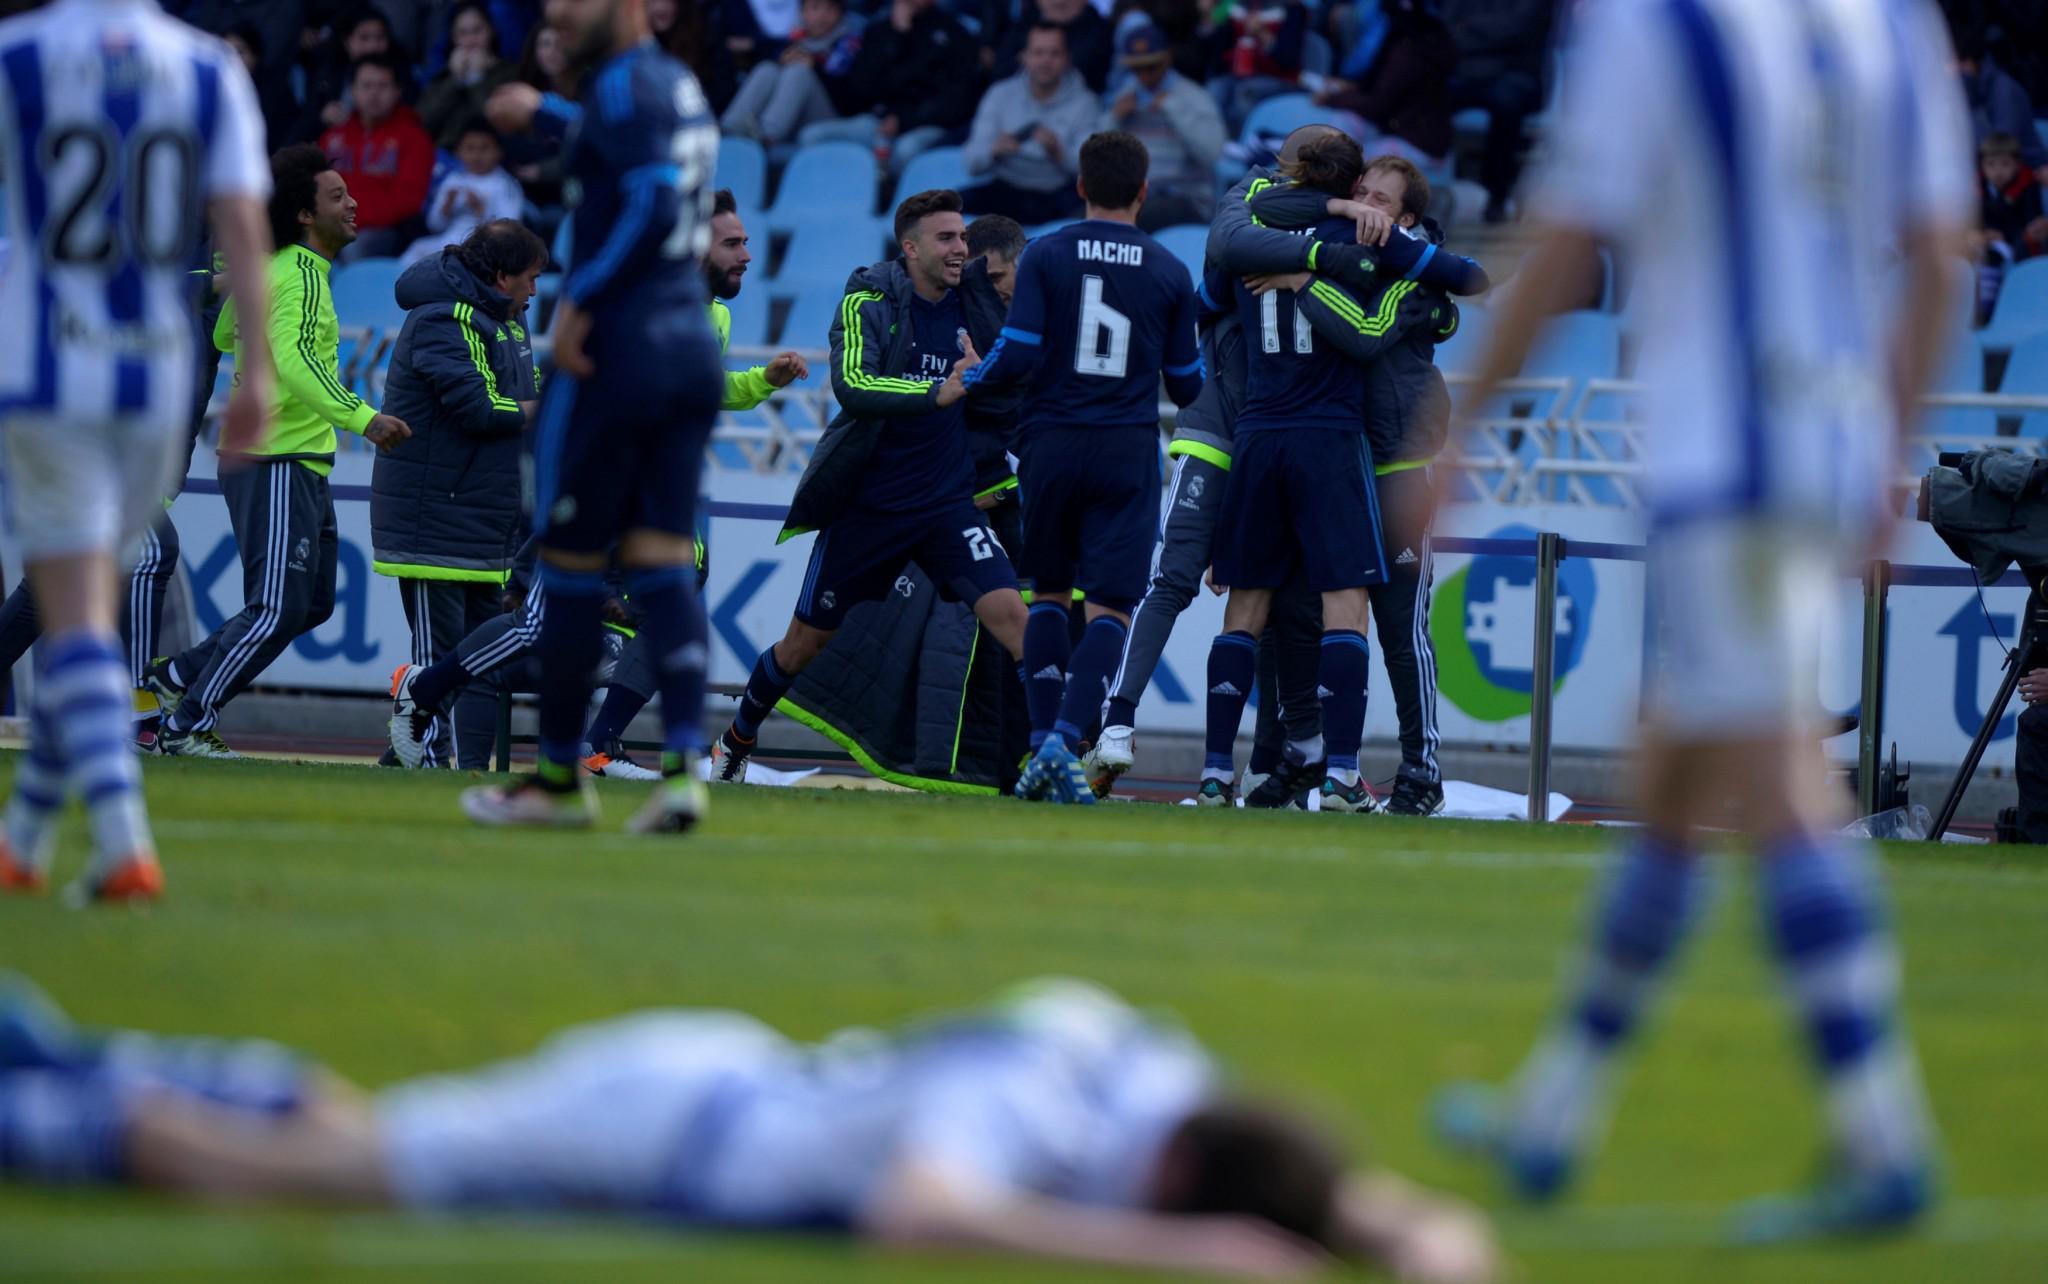 real-madrid-1000 Η μάχη στην κορυφή της Primera Division καλά κρατεί